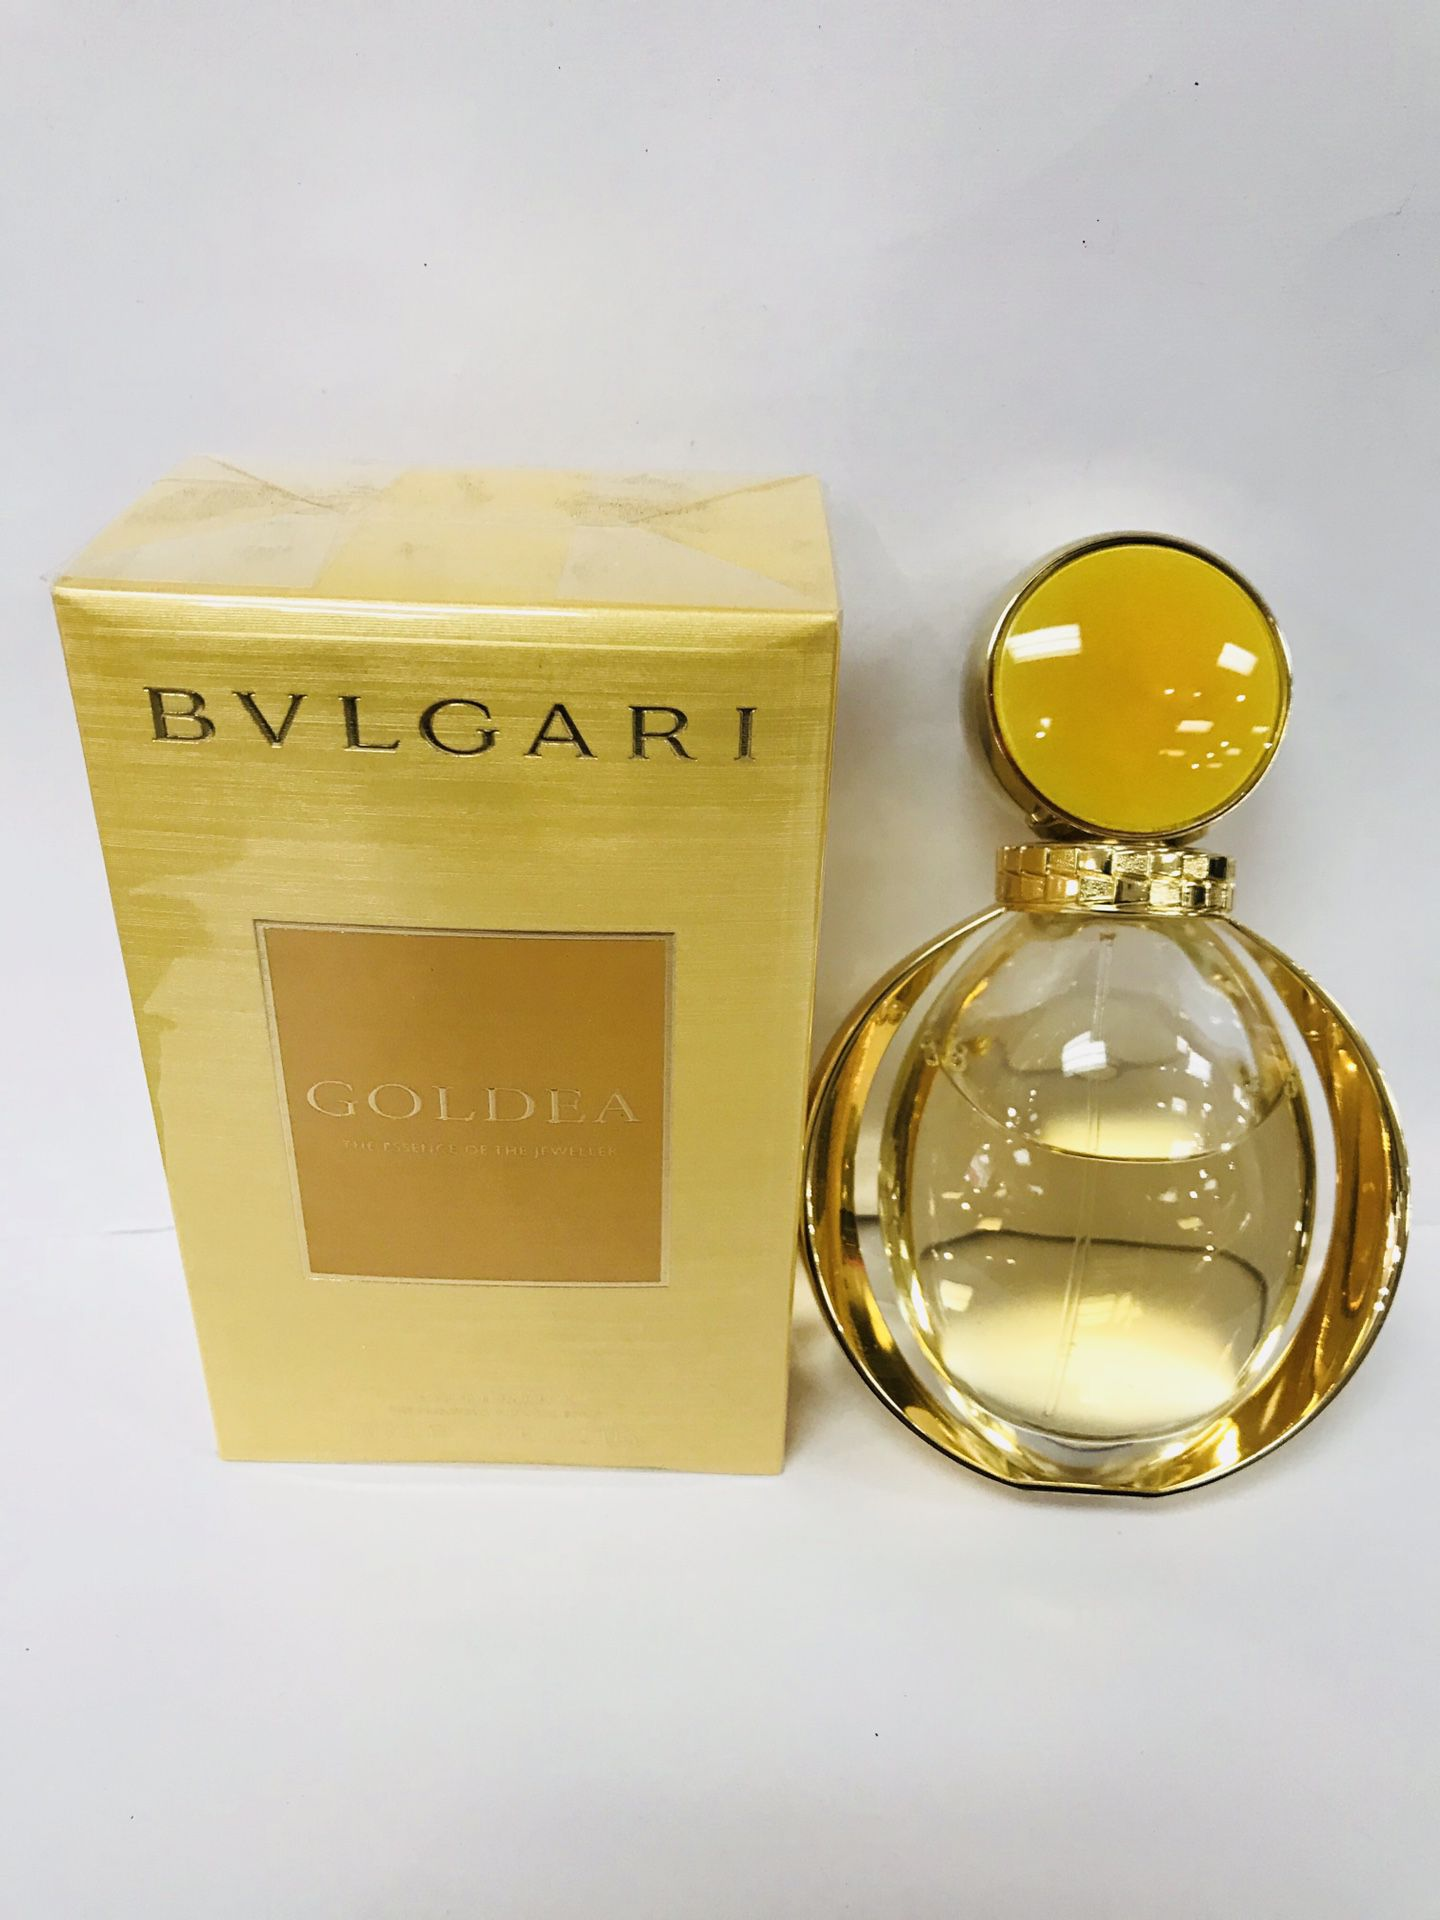 100 % authentic BVLGARI GOLDEA PERFUME FOR WOMEN. ORIGINAL BRAND NEW IN THE BOX